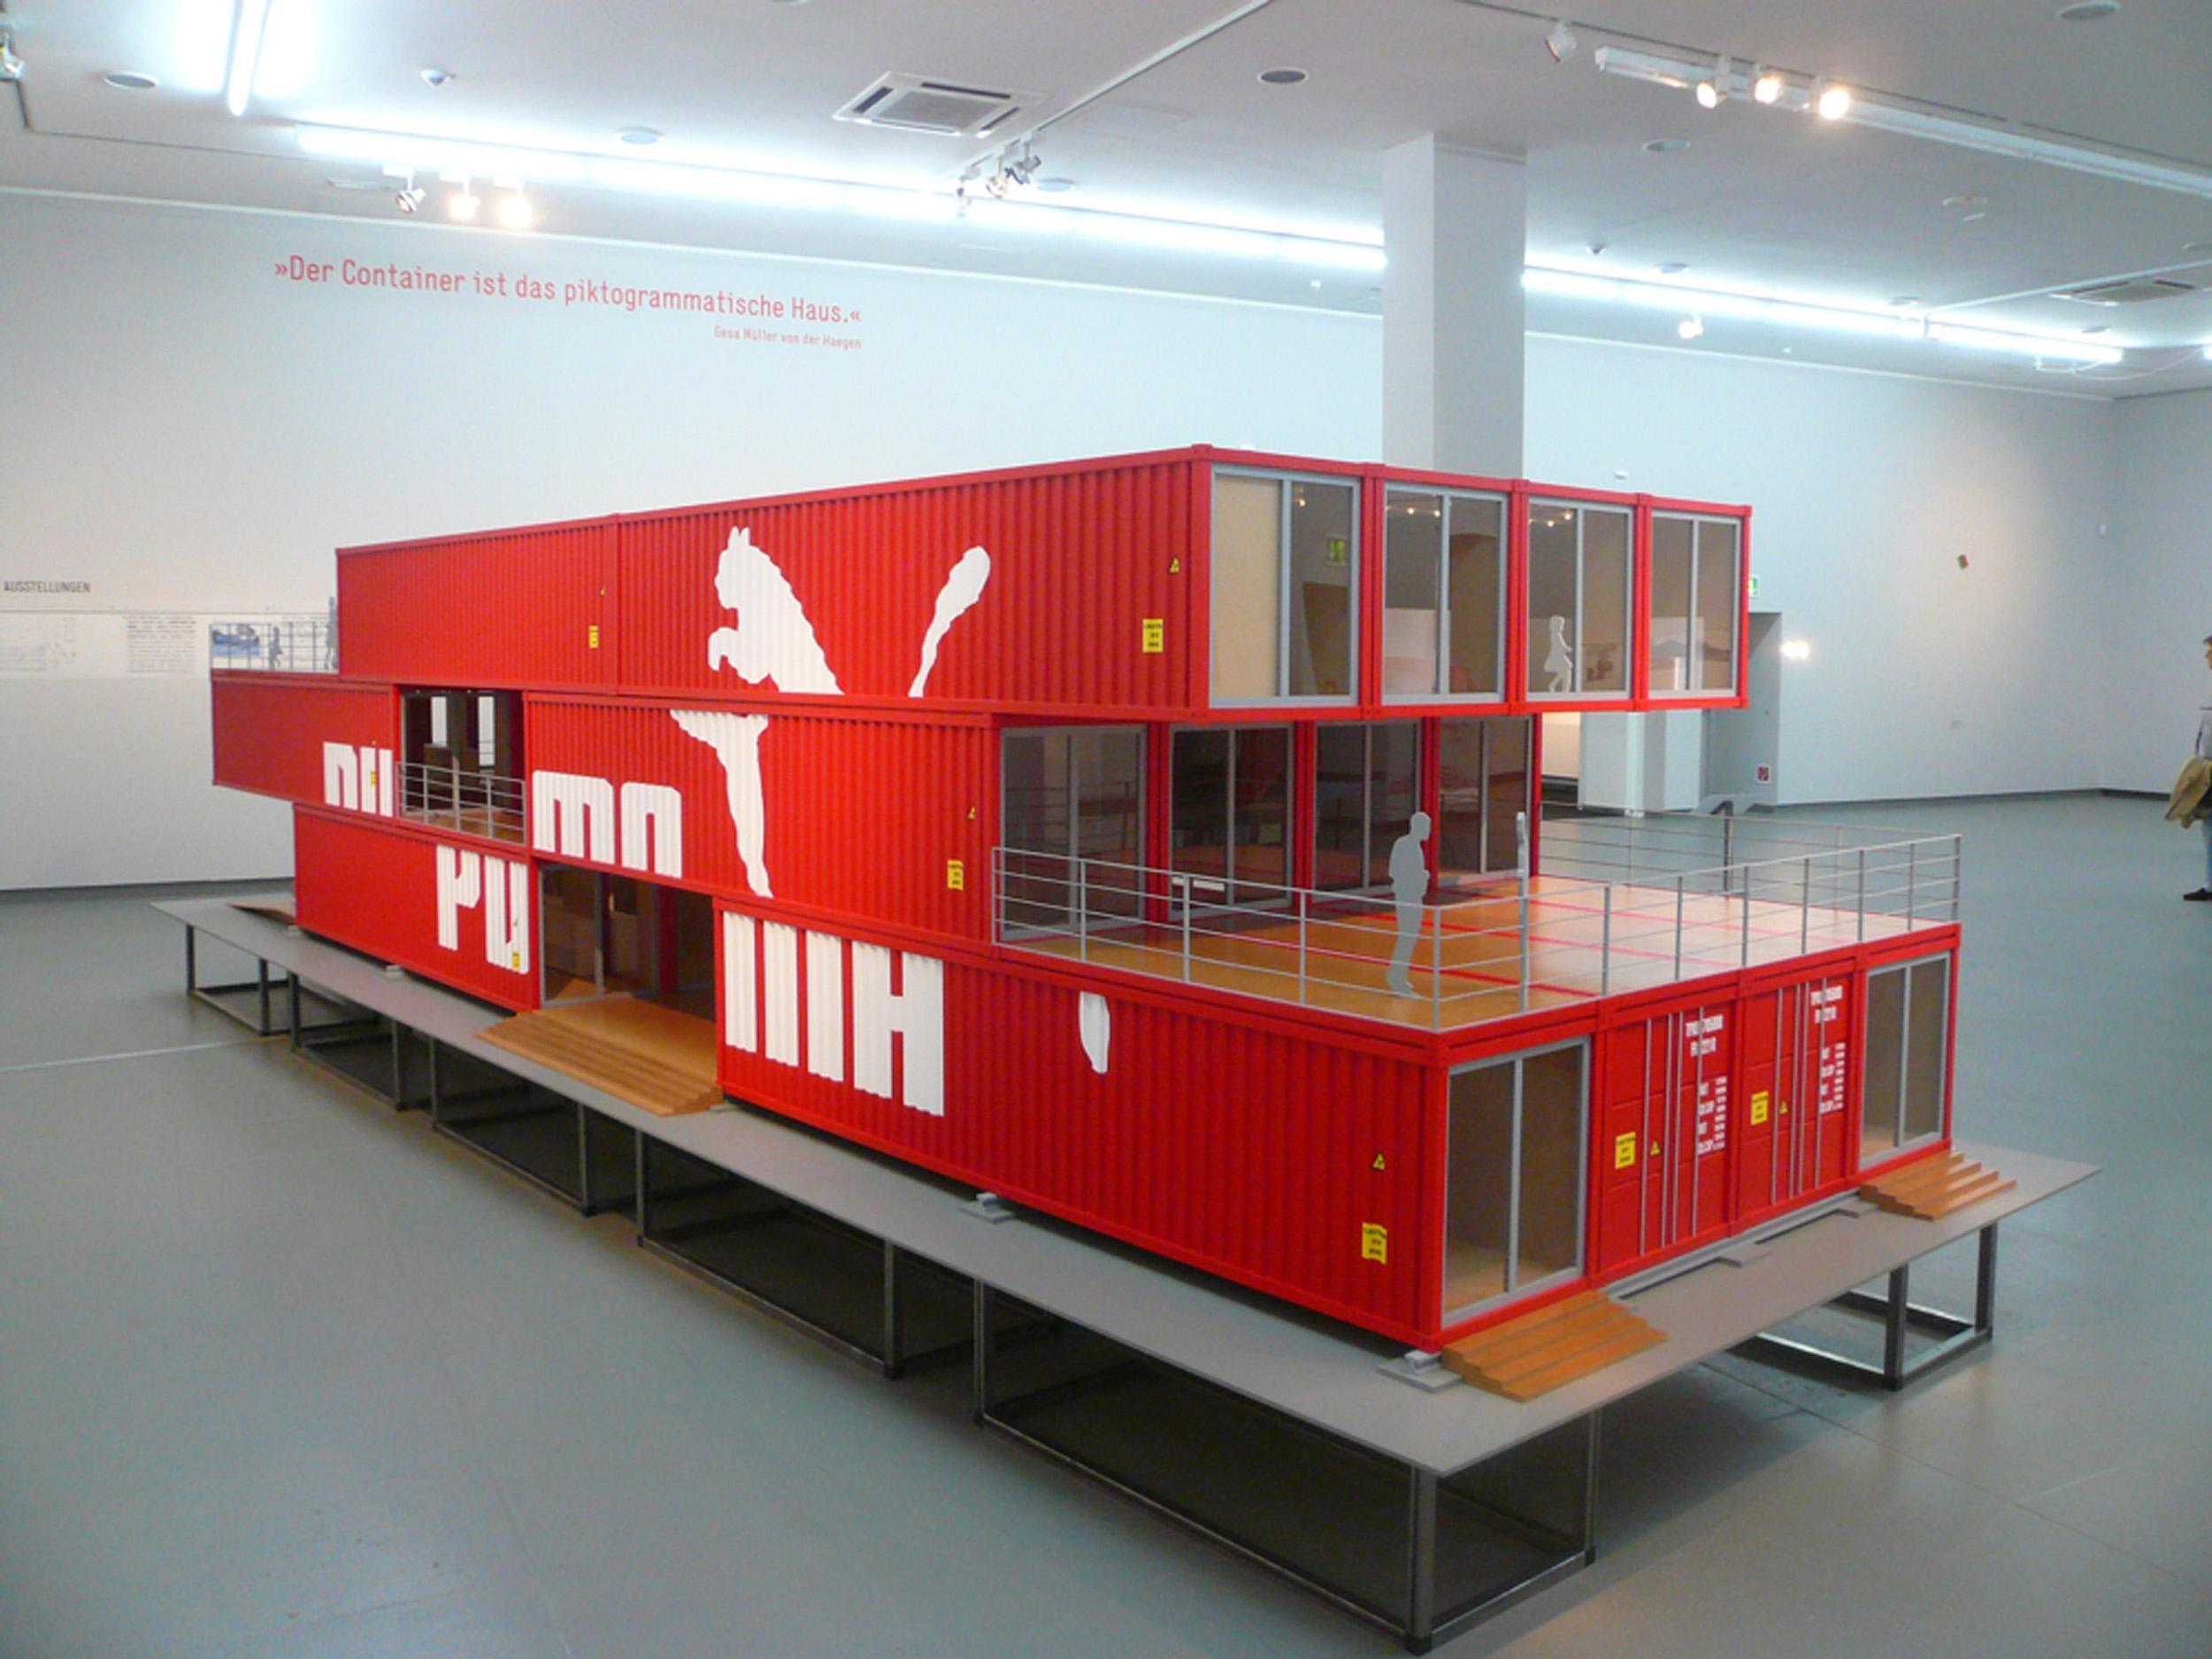 PUMA CITY - LOT-EK ARCHITECTURE & DESIGN